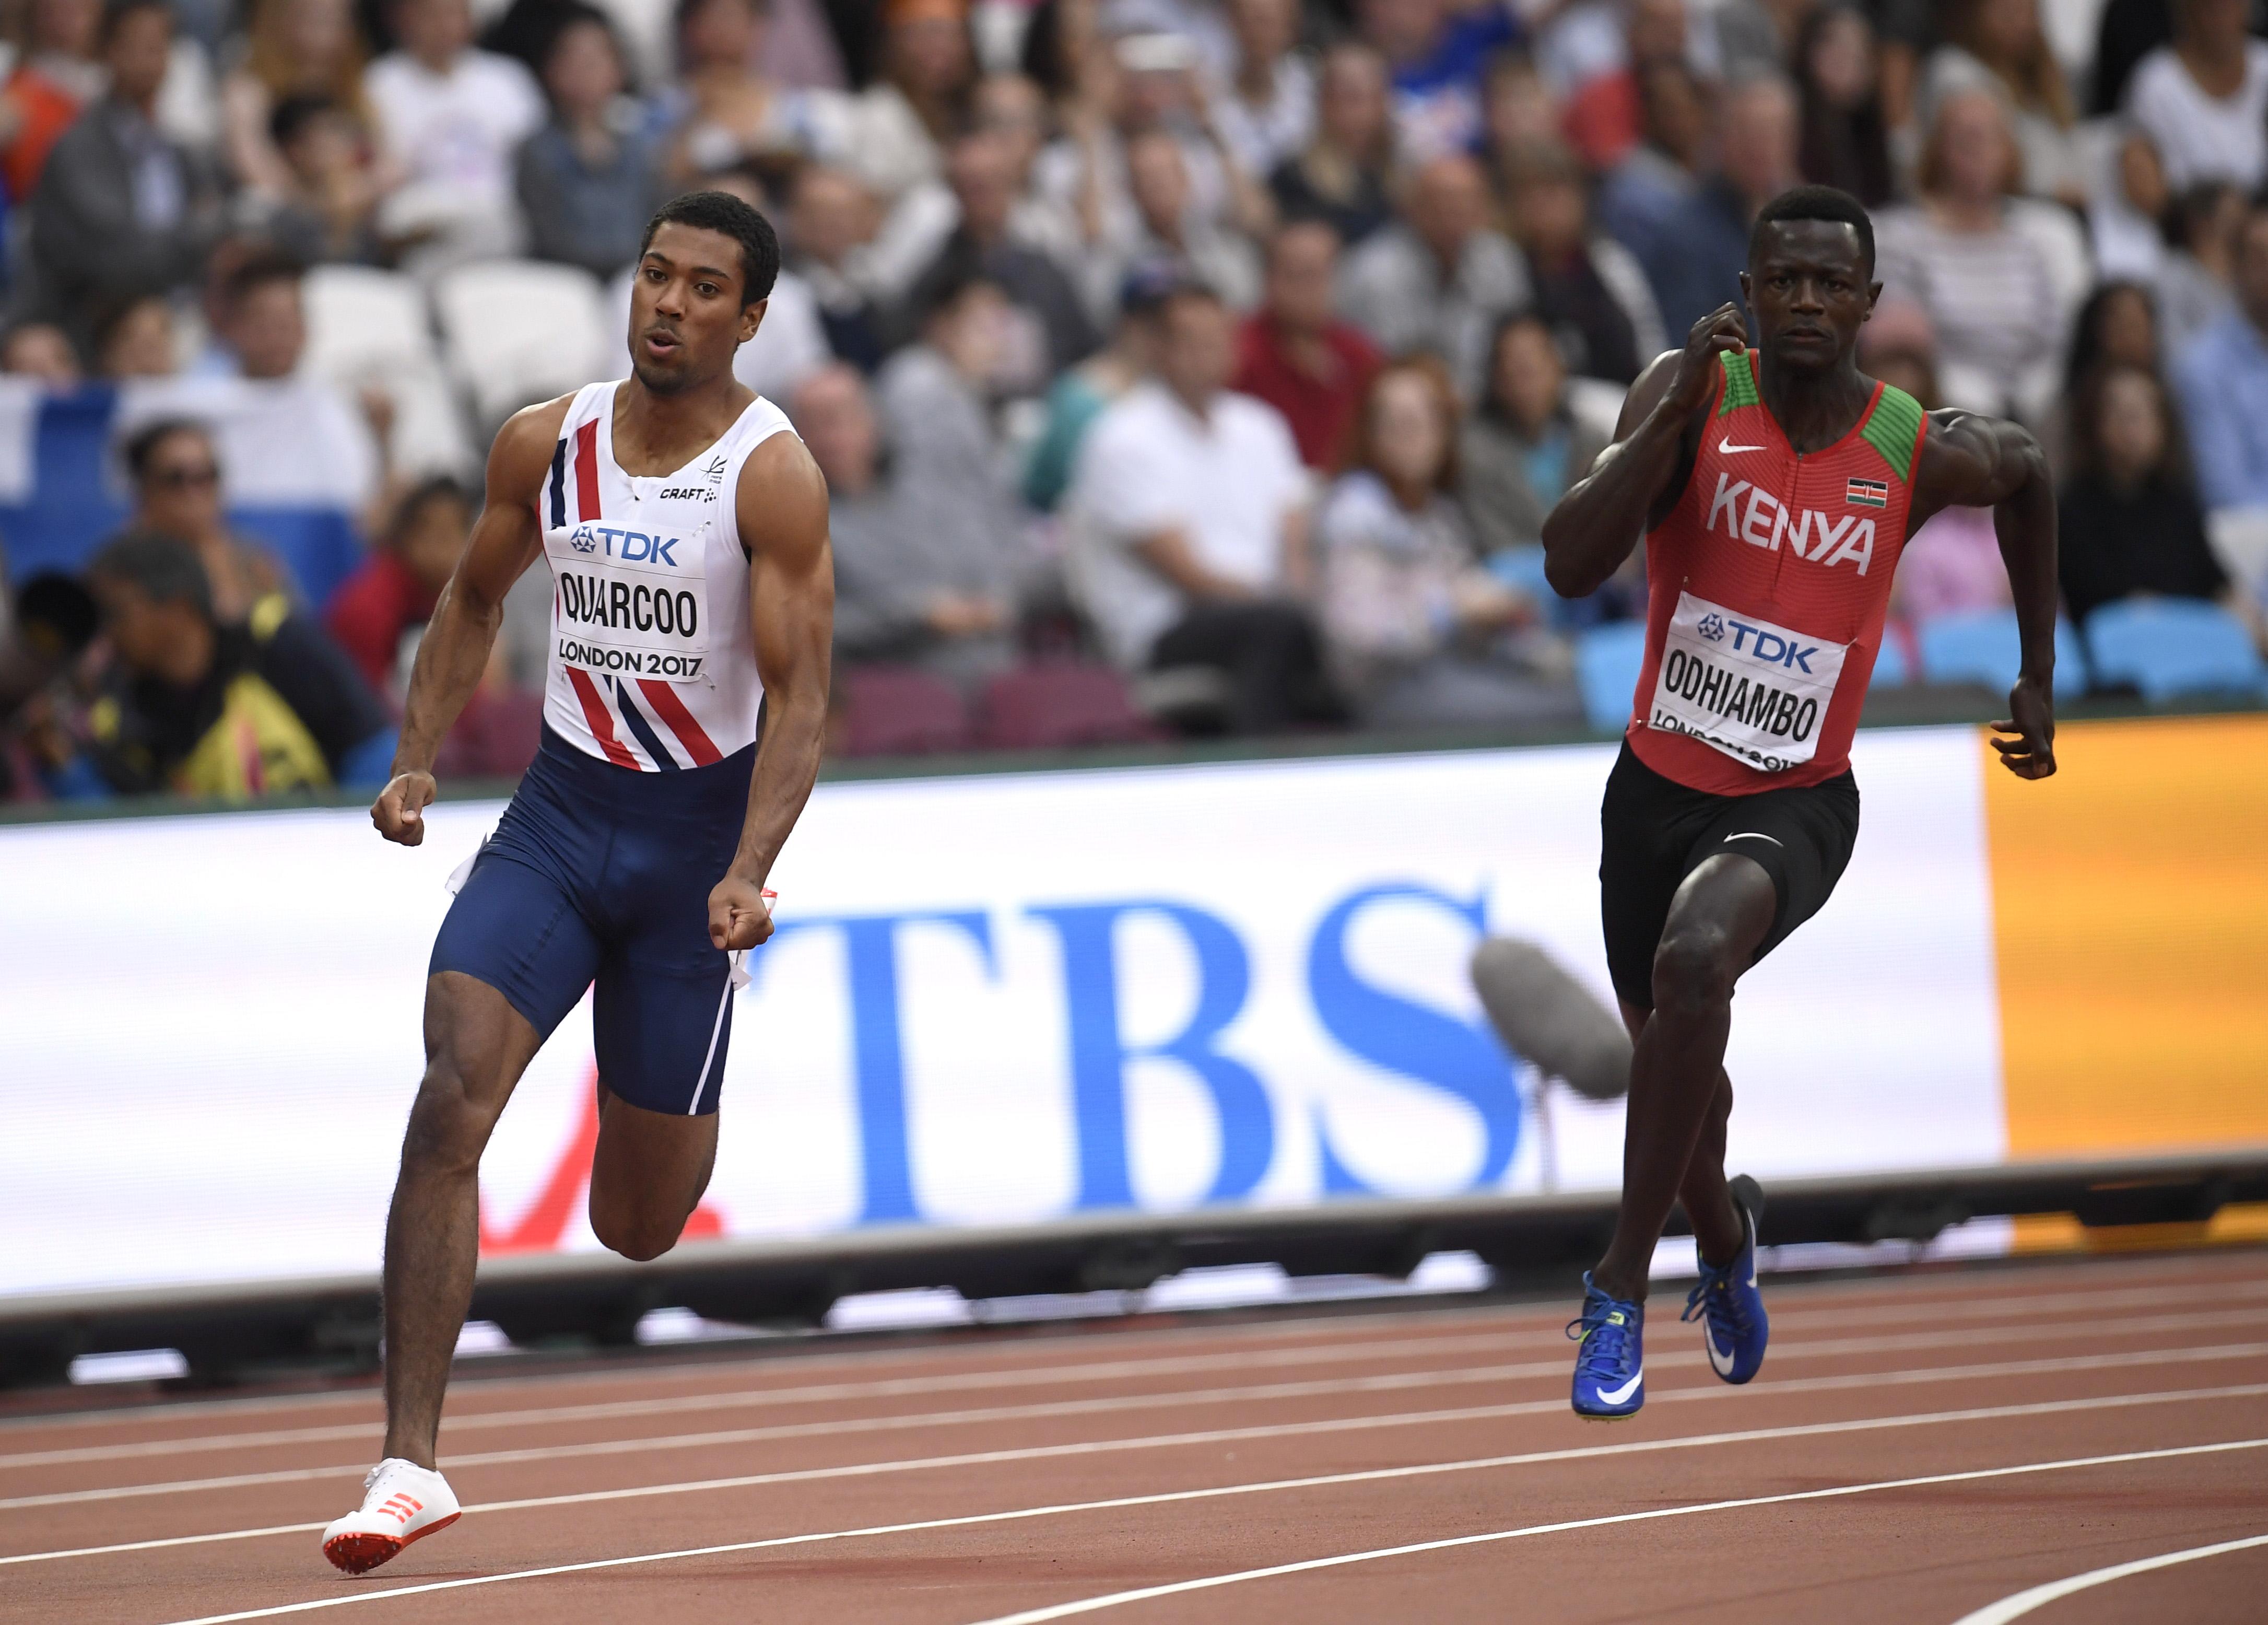 Athletics - World Athletics Championships - Men's 200 Metres Heats - London Stadium, London, Britain – August 7, 2017. Jonathan Quarcoo of Norway and Mark Otieno Odhiambo of Kenya in action. REUTERS/Toby Melville